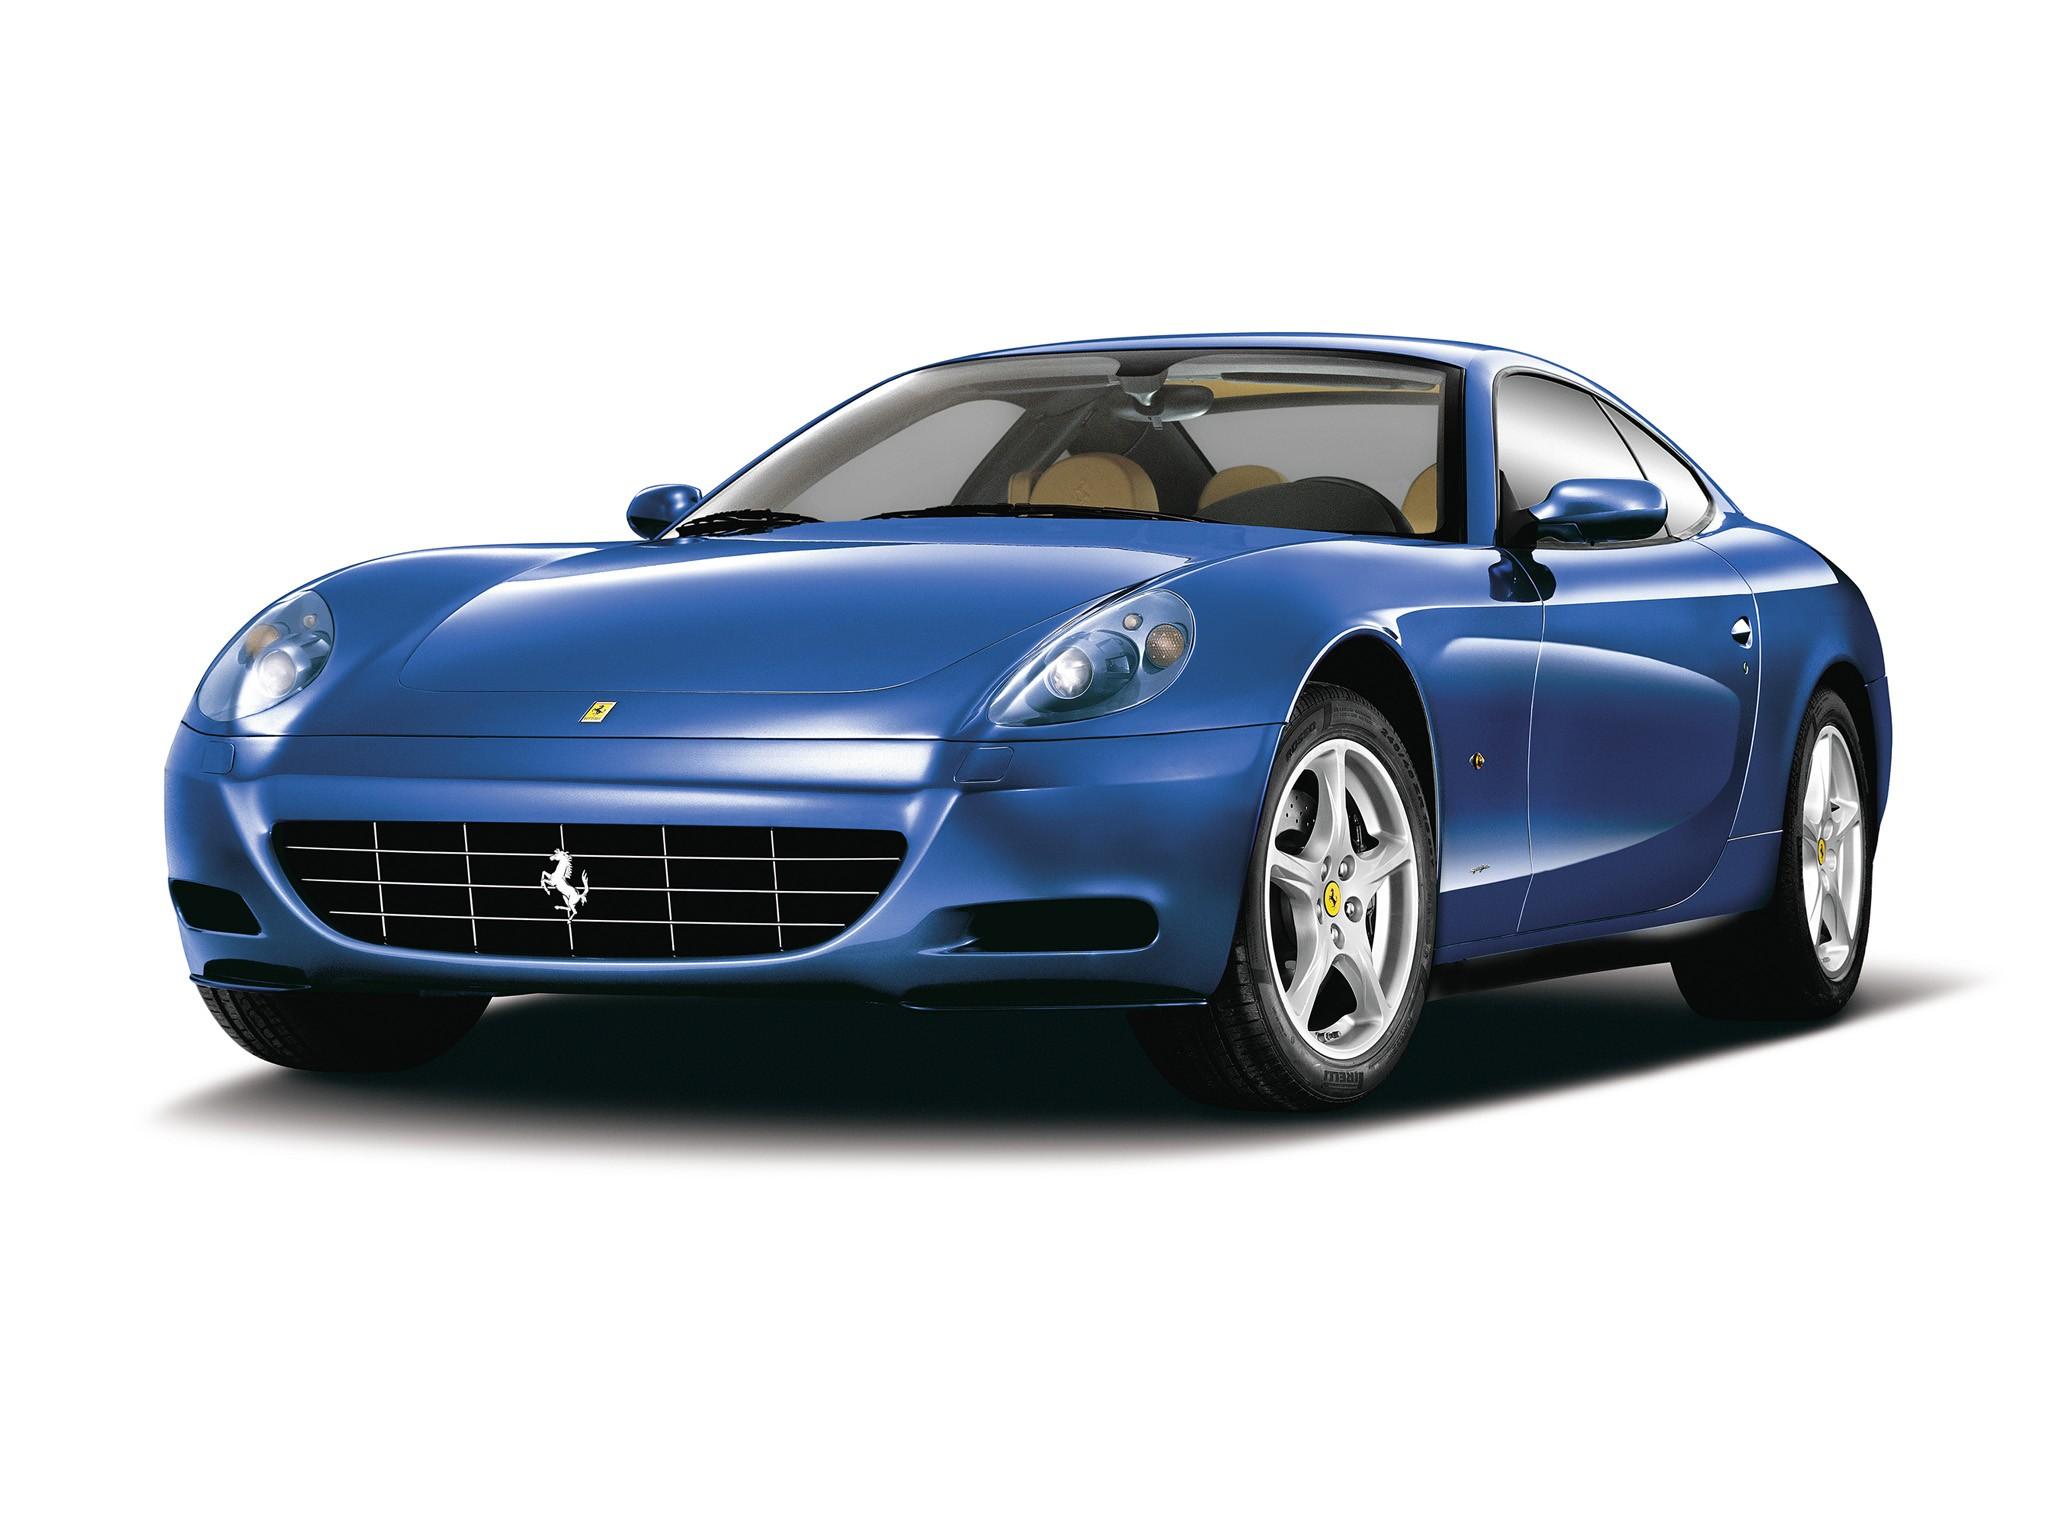 Ferrari 612 Scaglietti Spezifikationen Fotos 2004 2005 2006 2007 2008 2009 2010 2011 Autoevolution In Deutscher Sprache